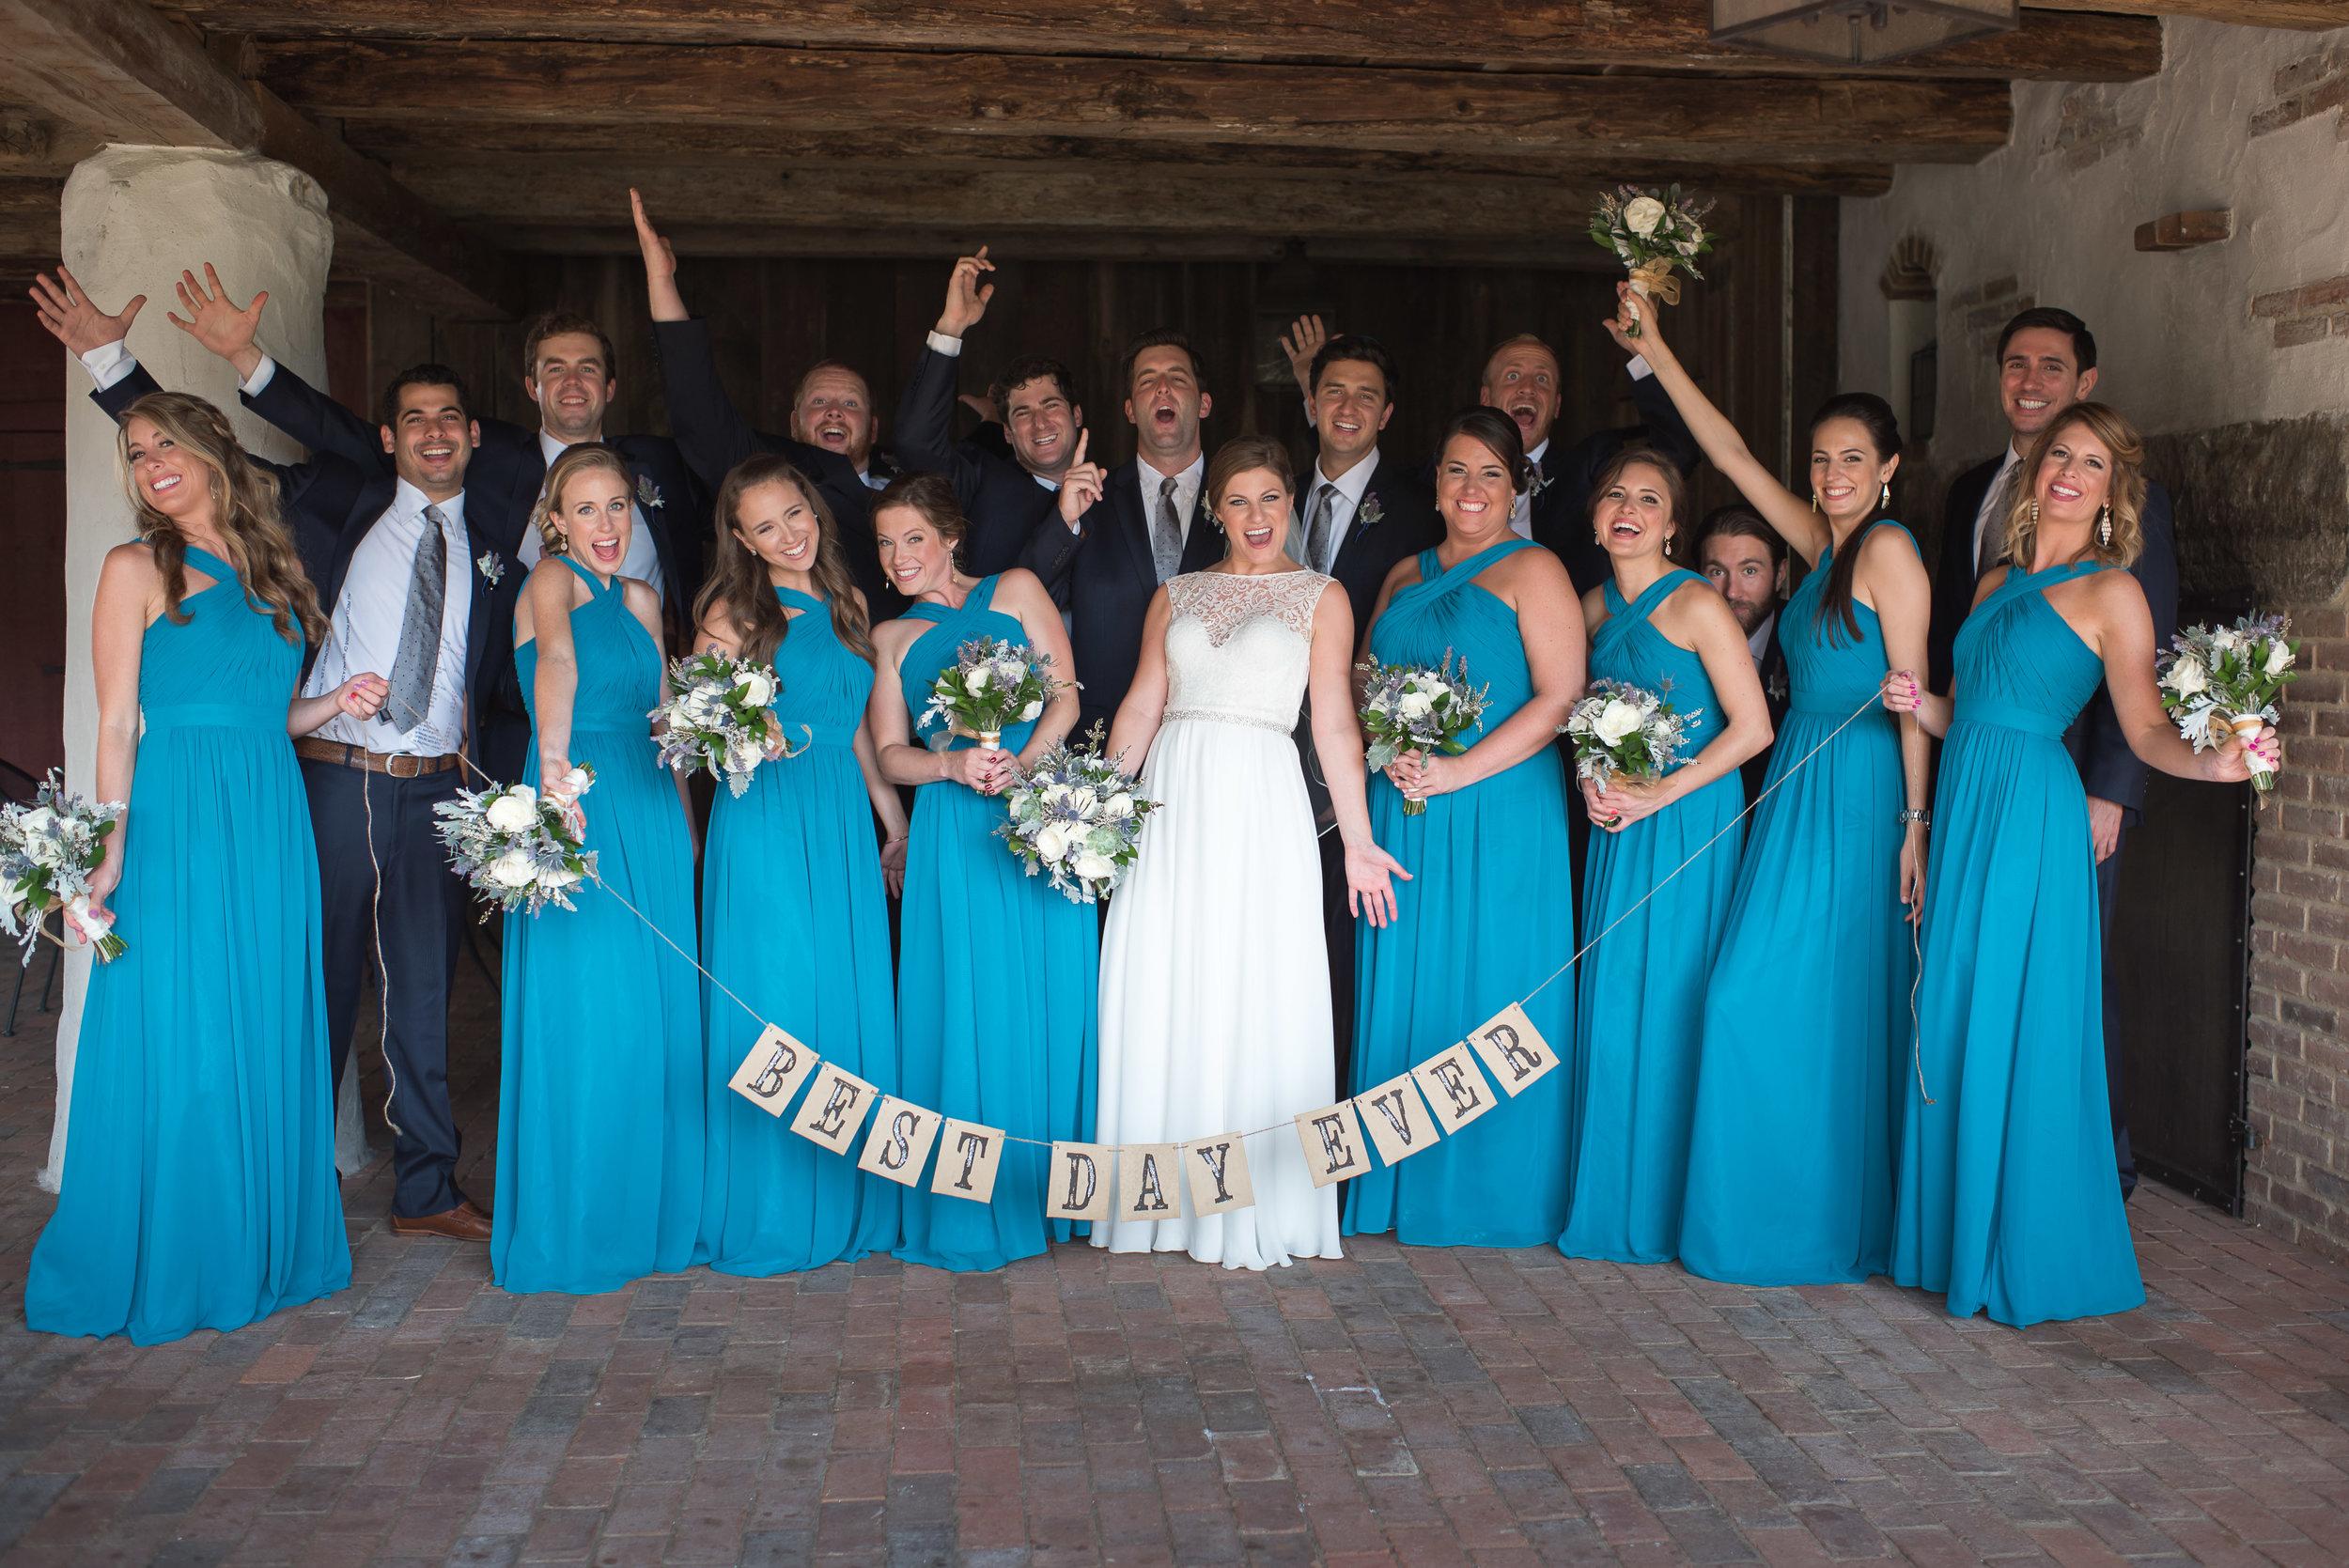 brandywine-wedding-tessie-reveliotis-photography-beautiful-and-blessed-events-024